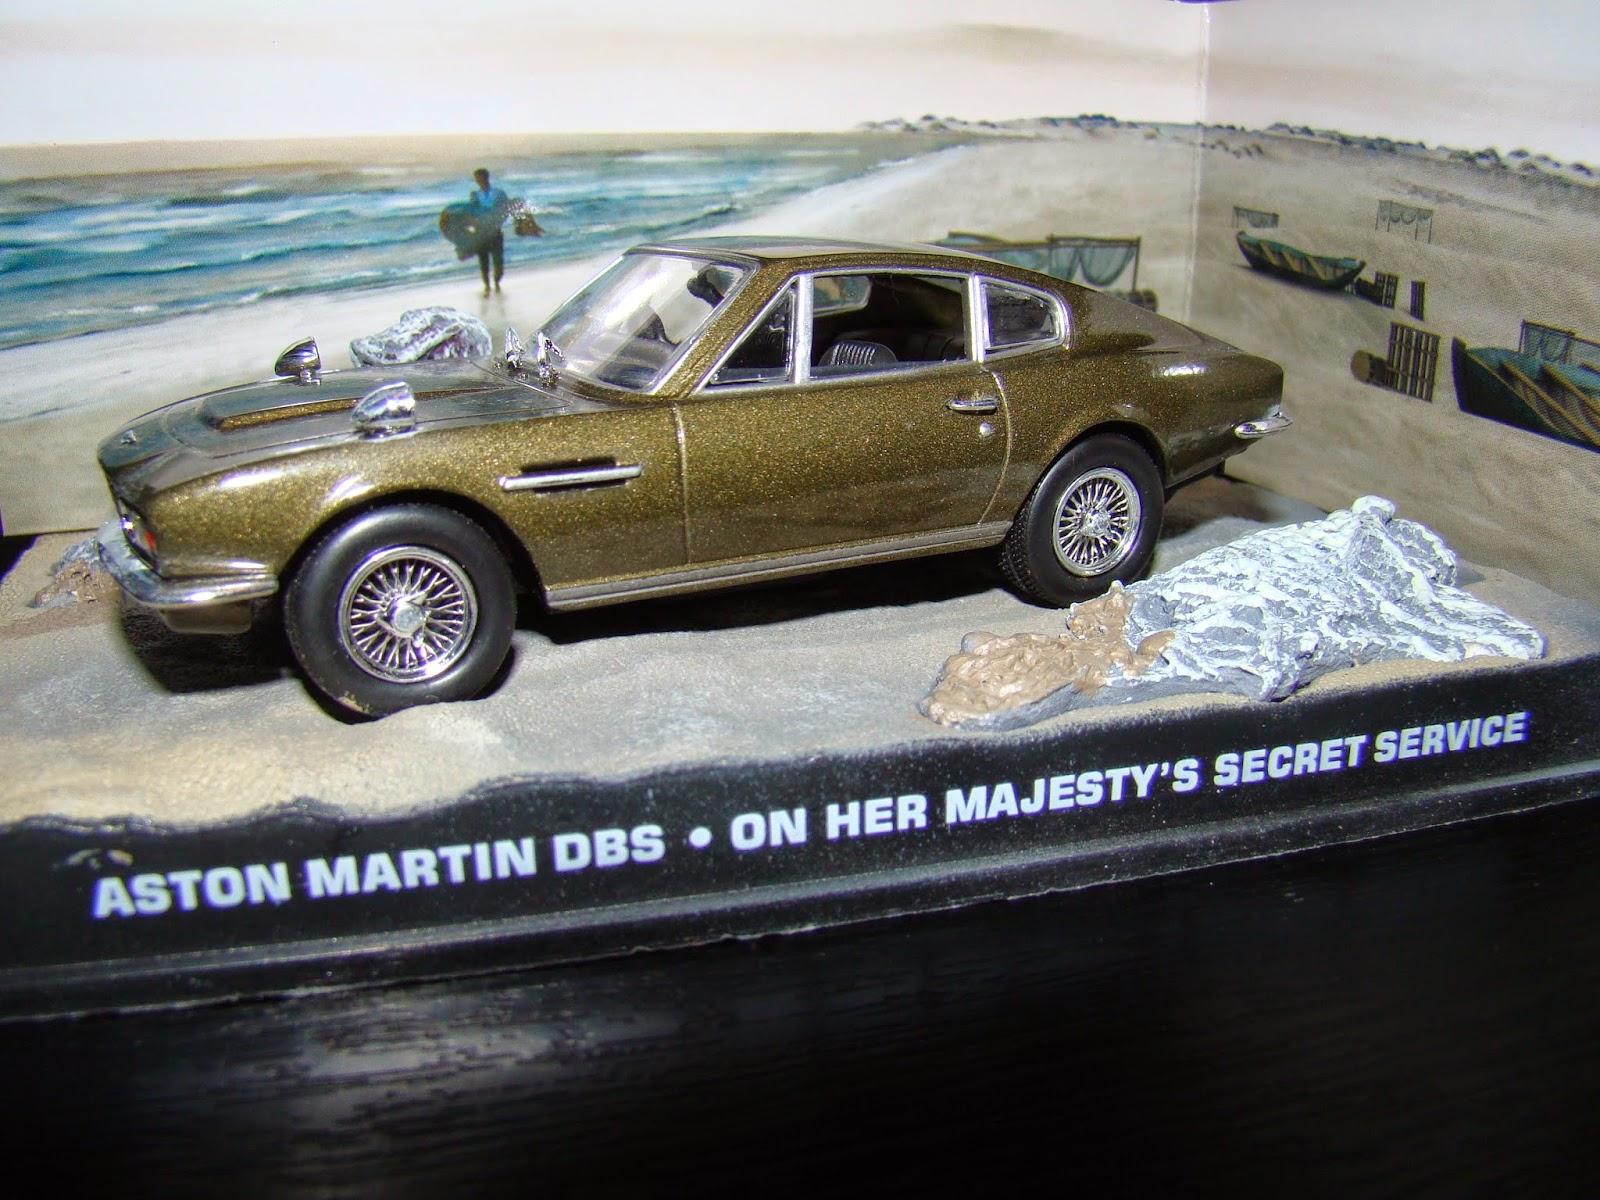 007 Vehicle Aston Martin Dbs On Her Majesty S Secret Service 1969